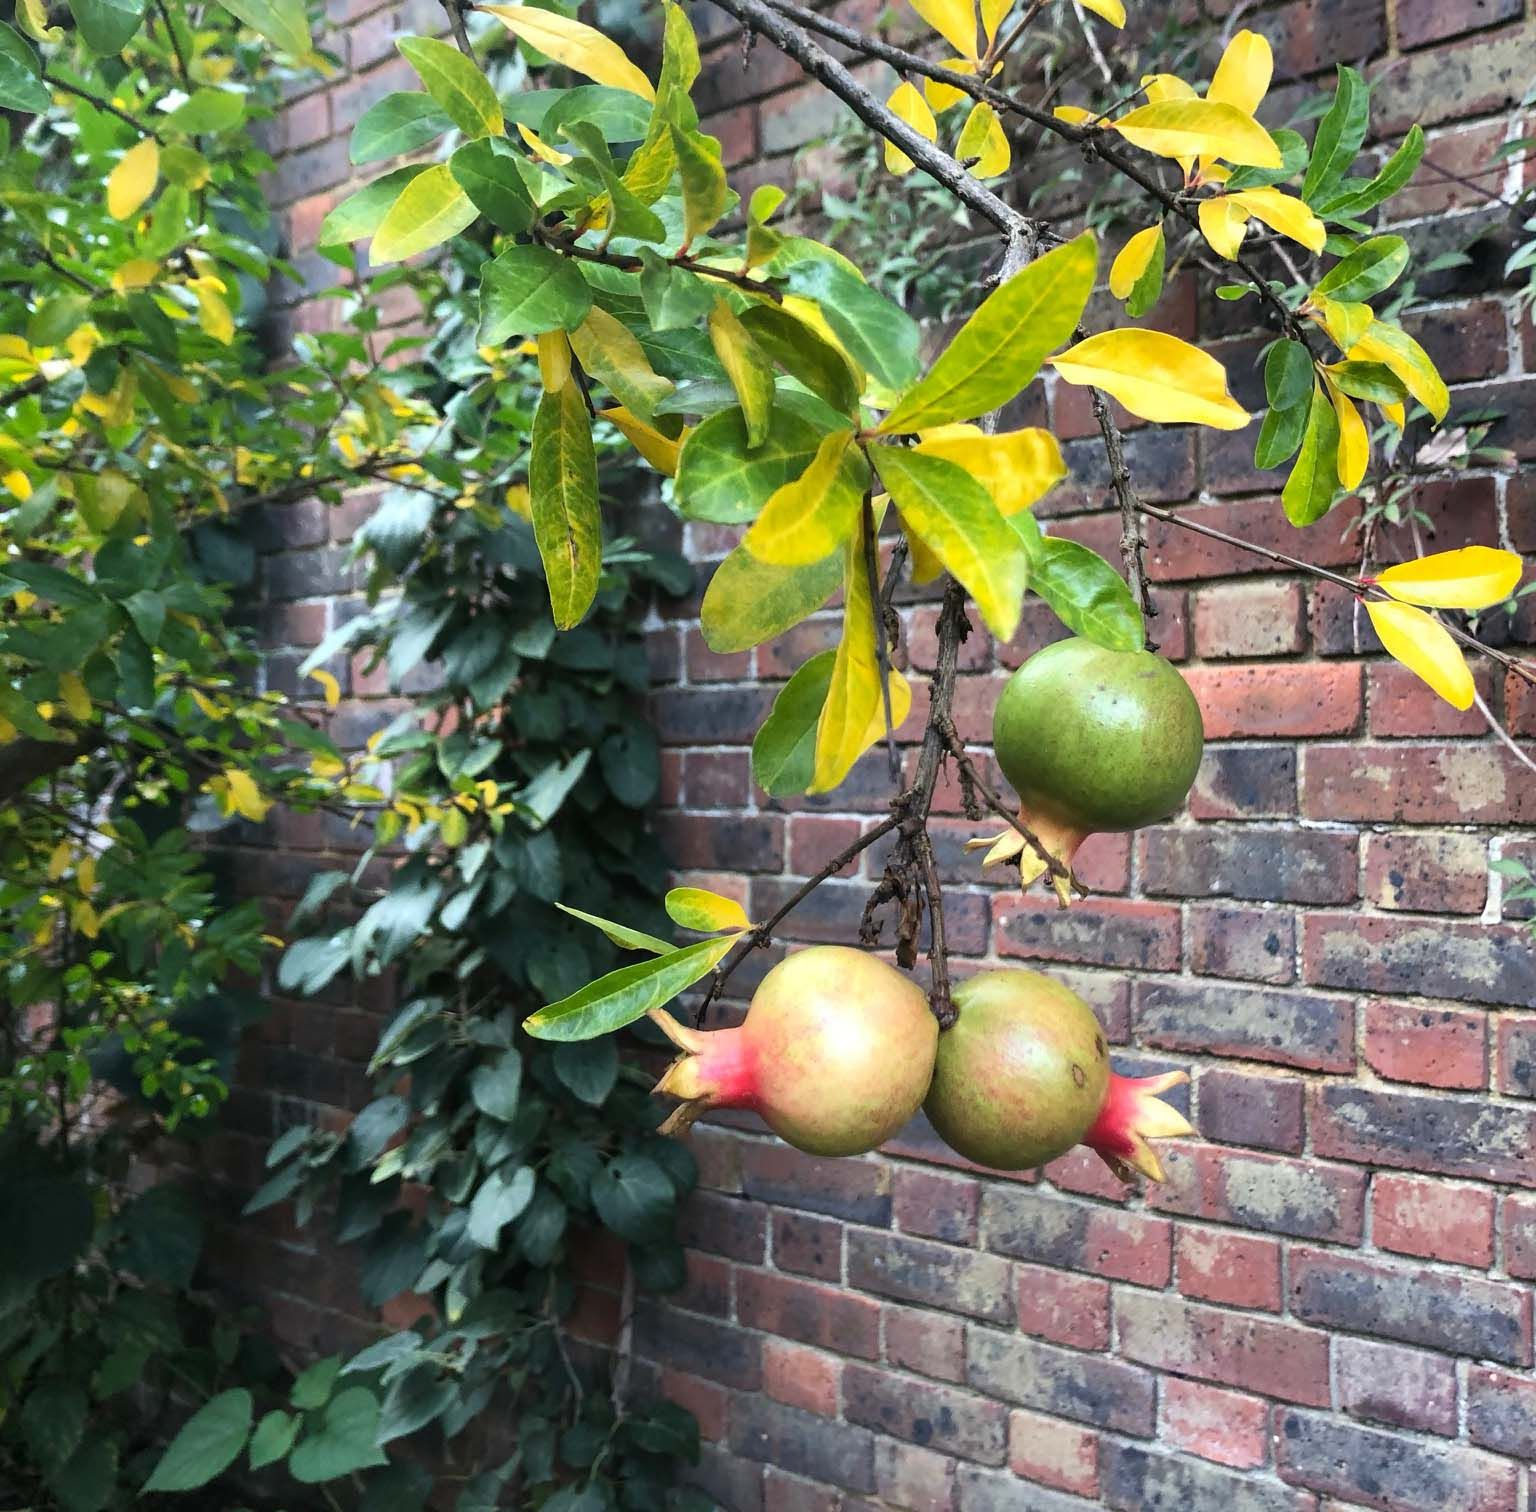 Punica Granatum Pomegranate Trees For Sale Uk Buy Online Growing Fruit Trees Fruit Trees Growing Fruit